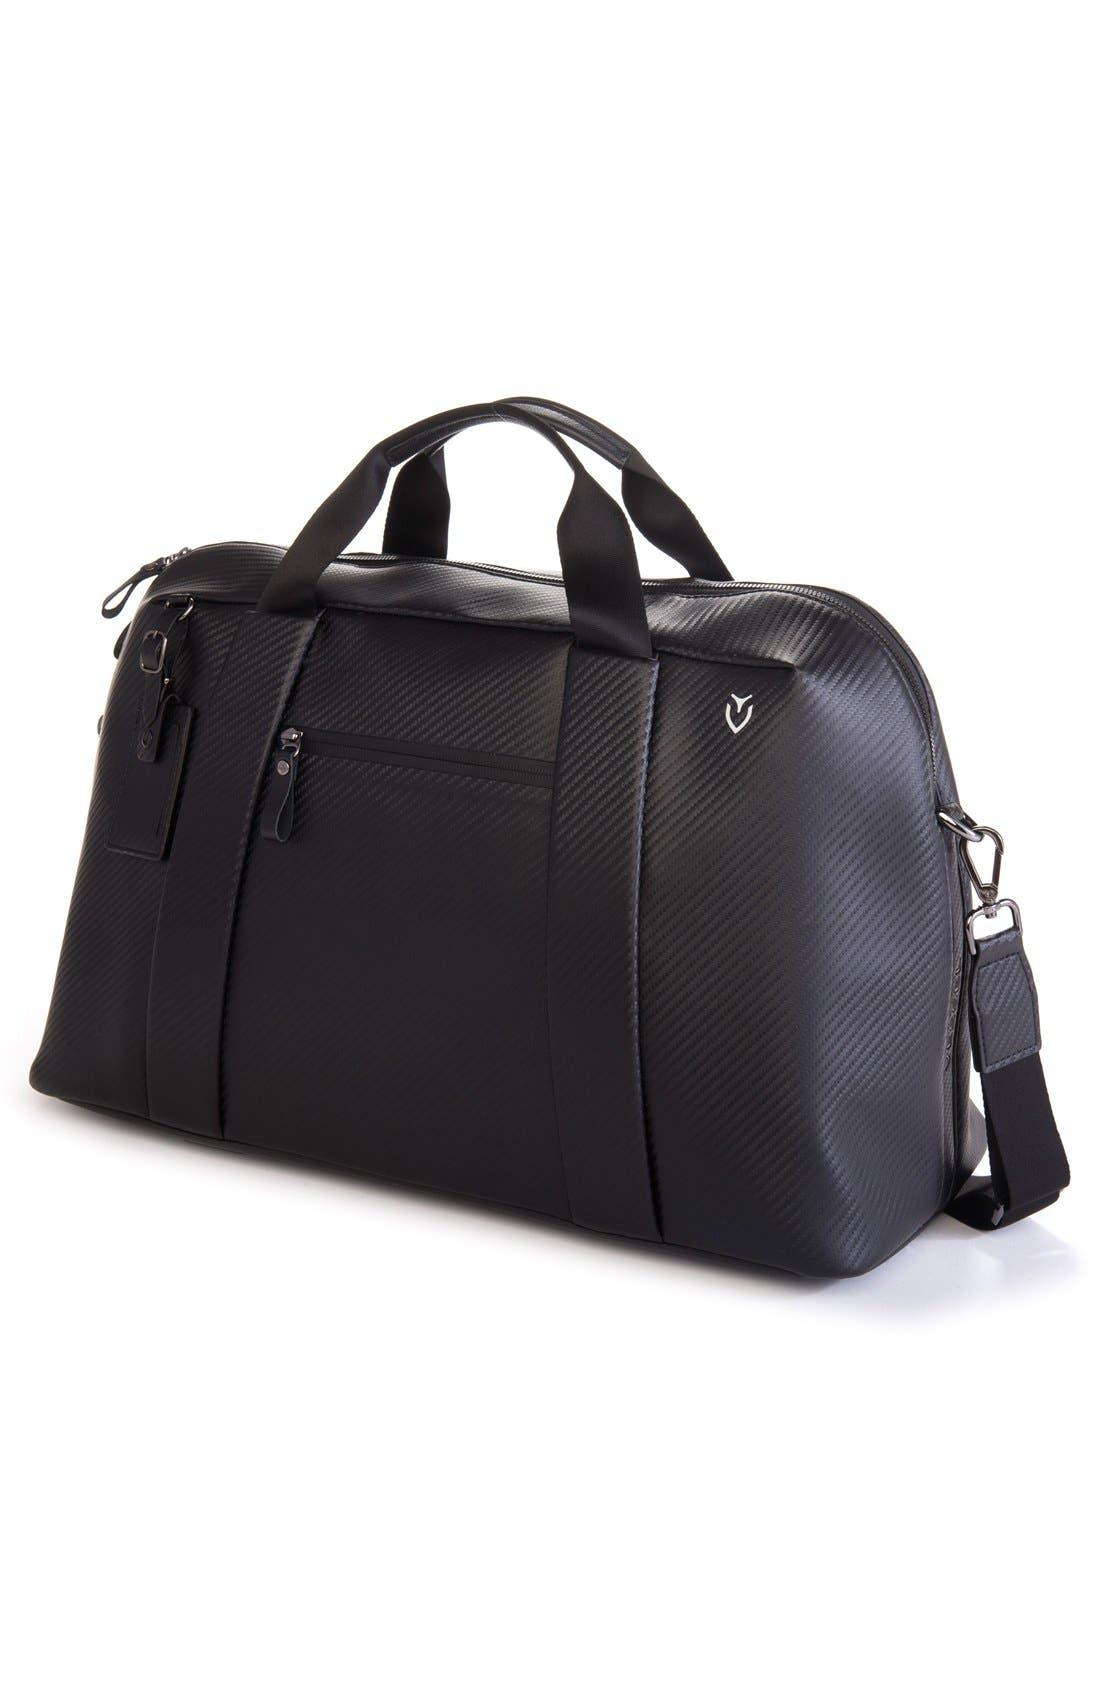 'Signature' Large Duffel Bag,                             Alternate thumbnail 3, color,                             CARBON BLACK